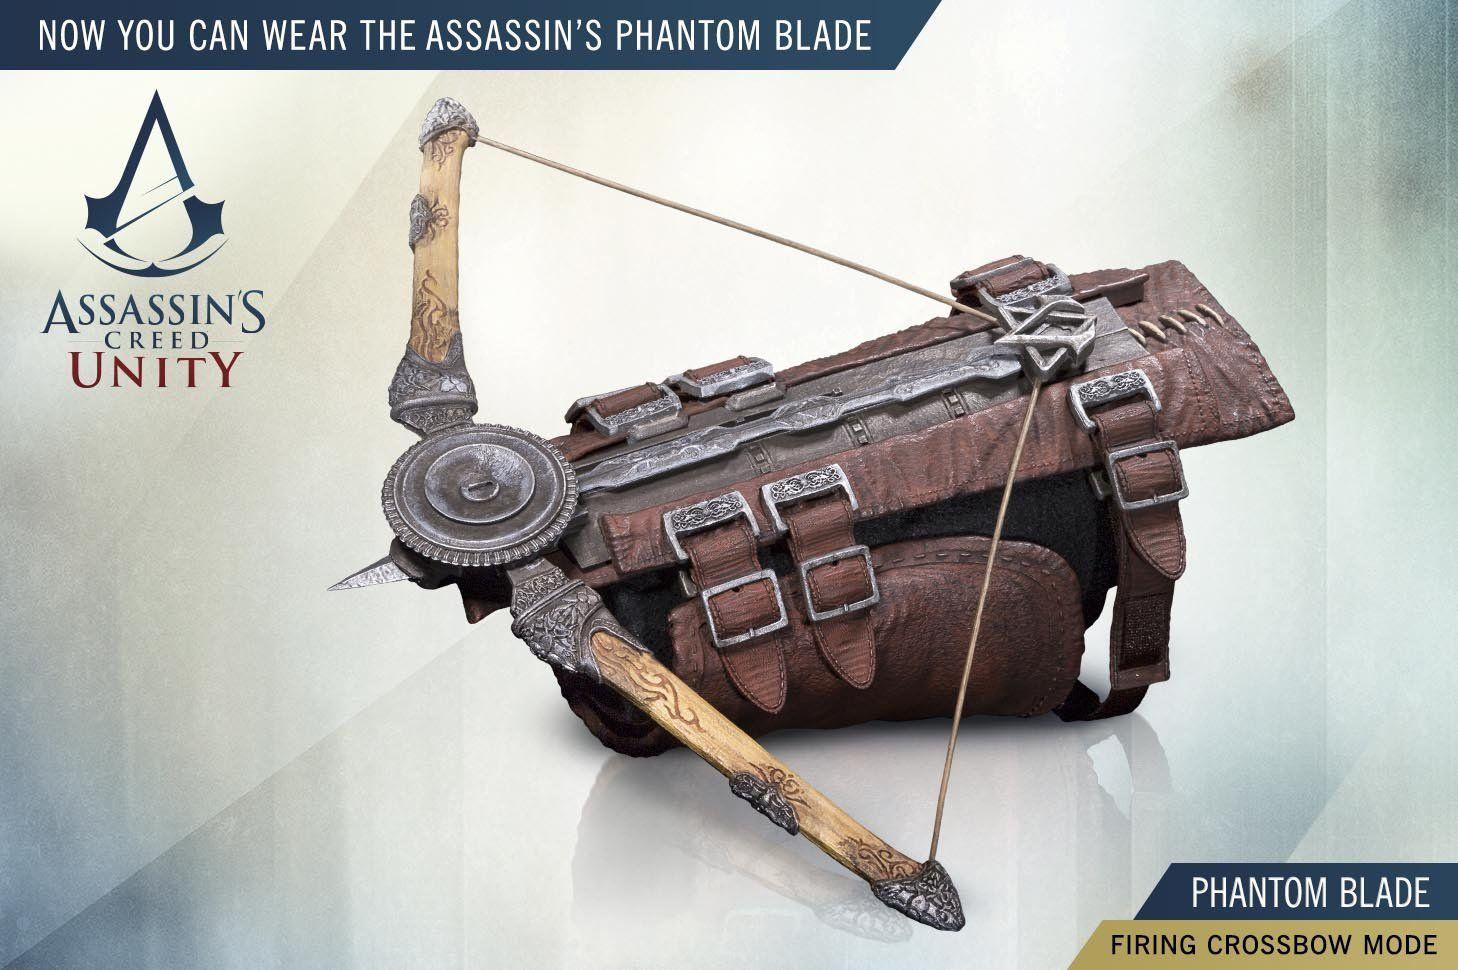 Amazon.com  Ubisoft Assassin s Creed Unity Phantom Blade  Toys   Games 4f1f0745b2fe